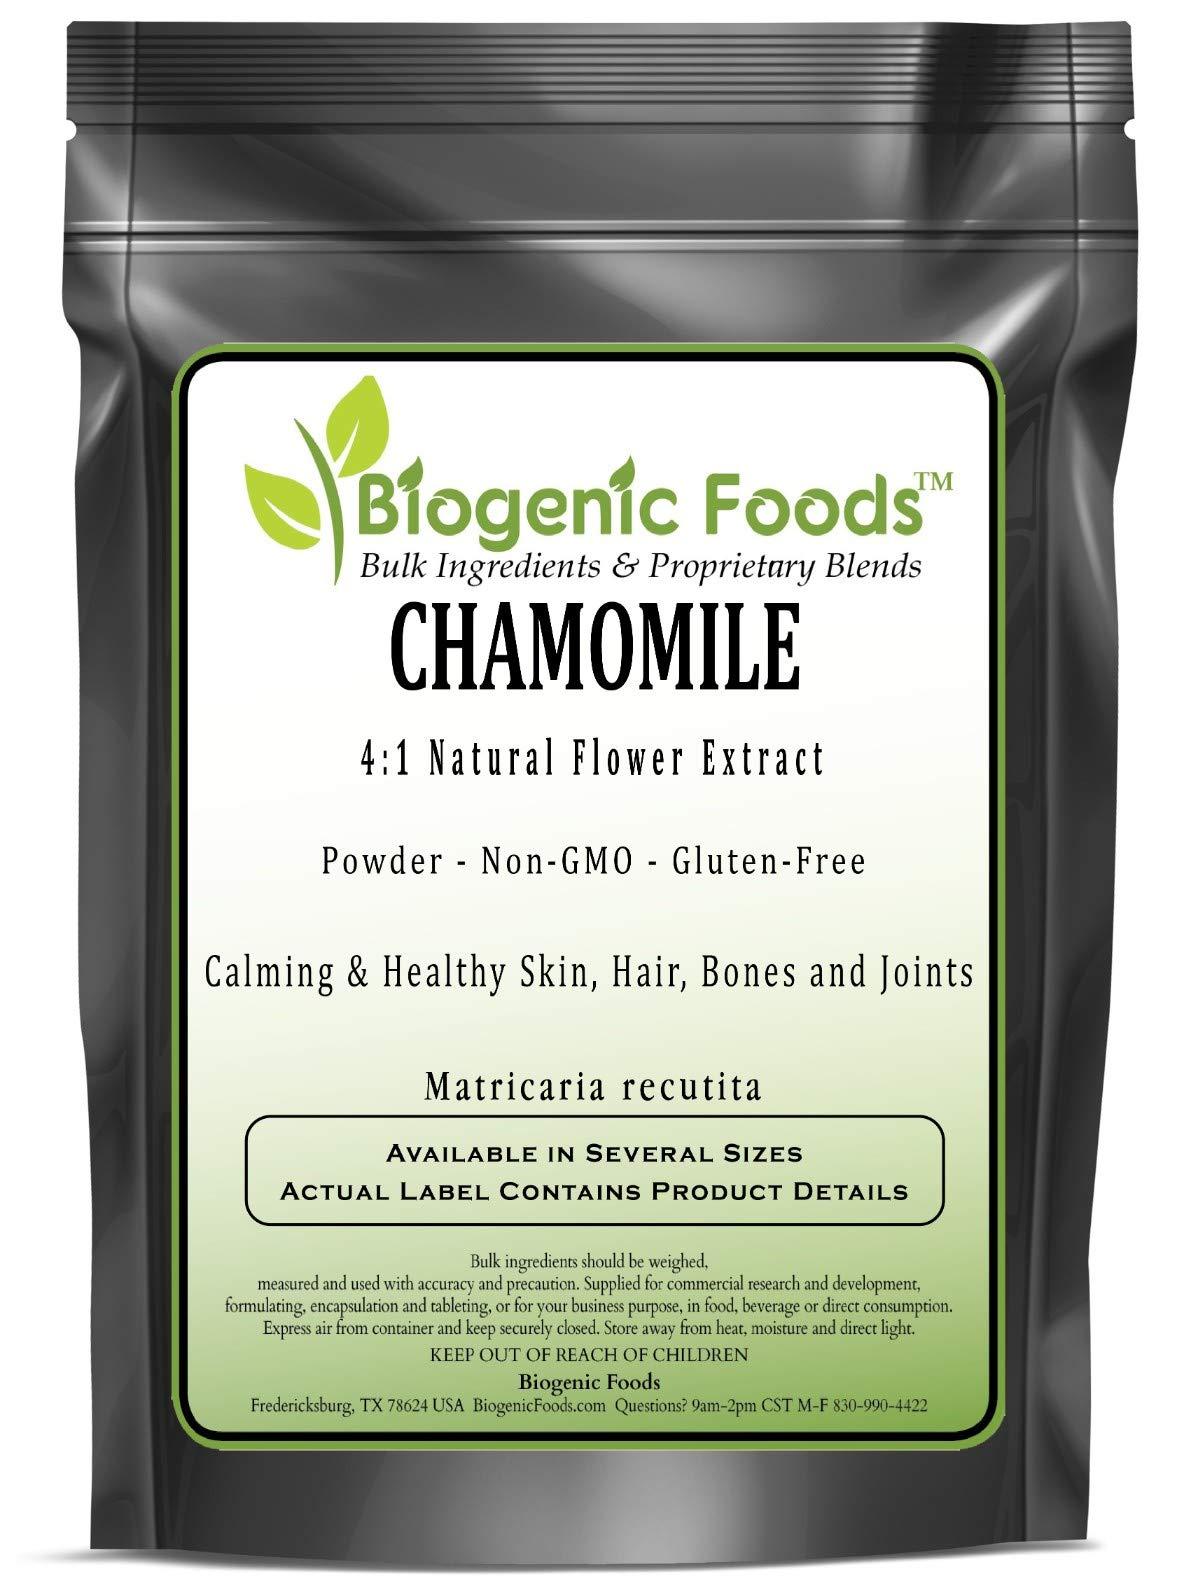 Chamomile - 4:1 Natural Flower Powder Extract (Matricaria recutita), 10 kg